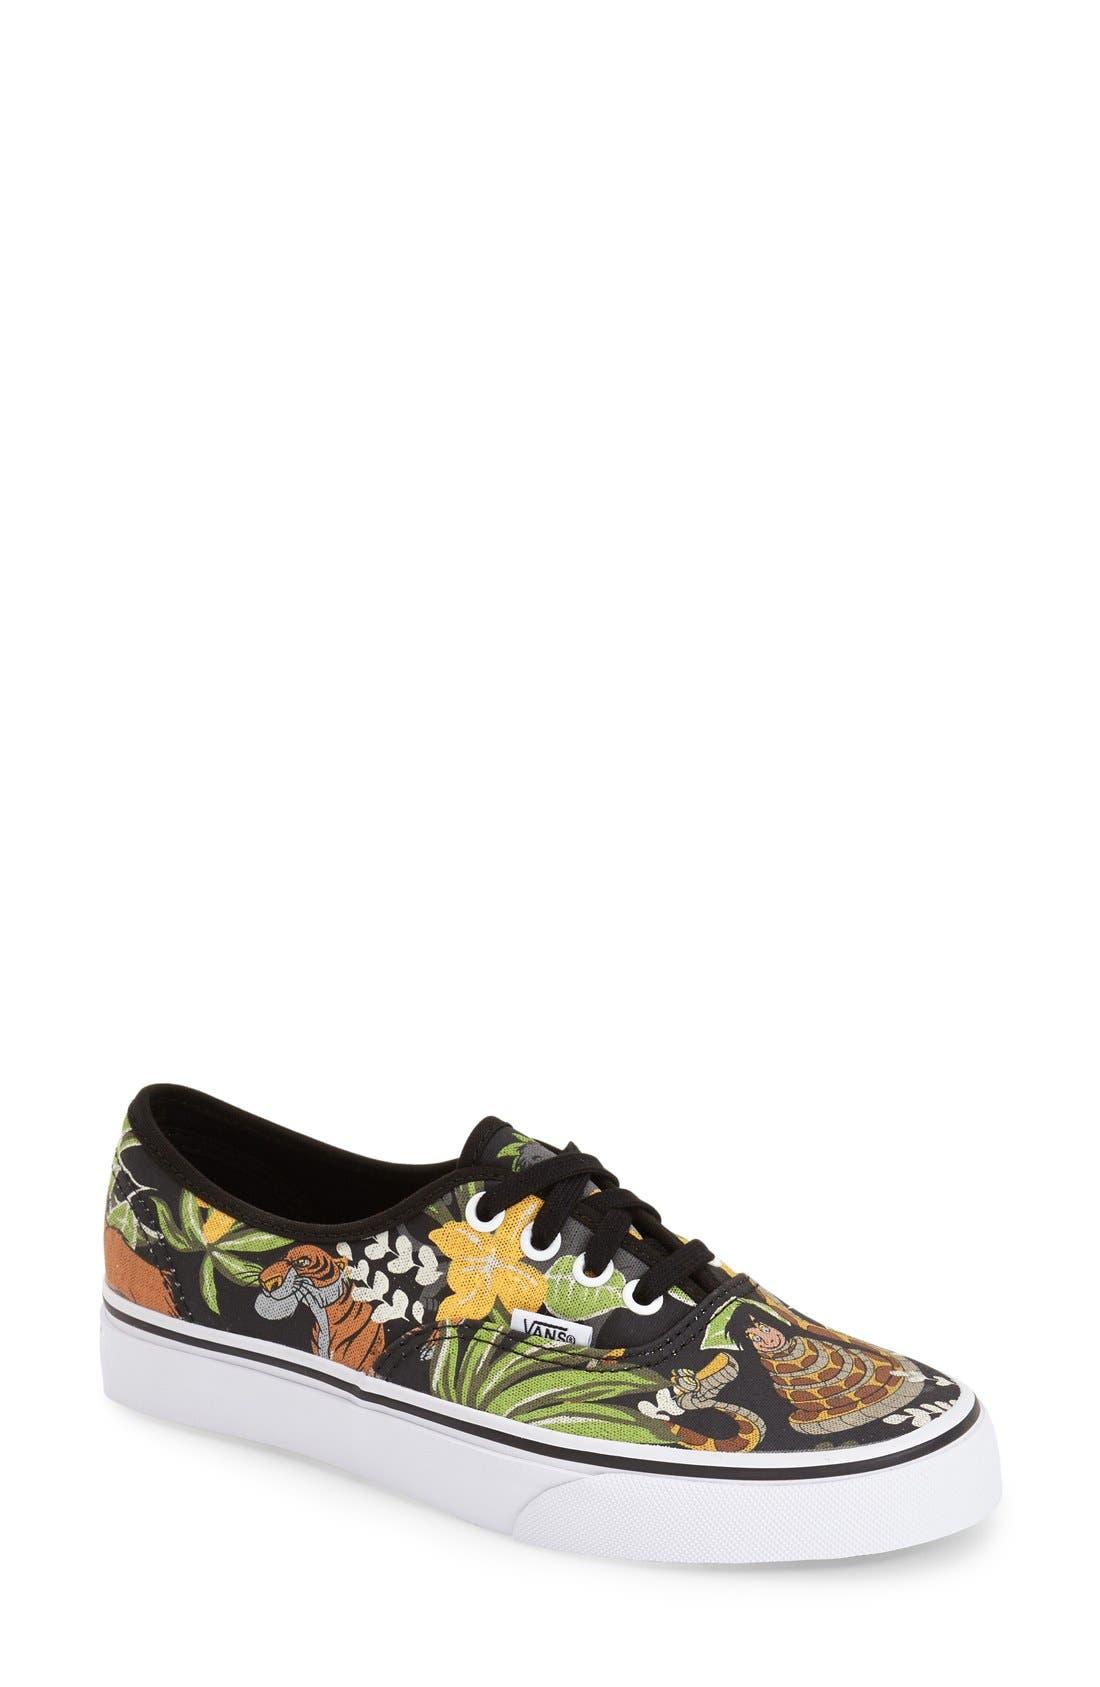 Main Image - Vans 'Authentic - Disney® The Jungle Book' Sneaker (Women)